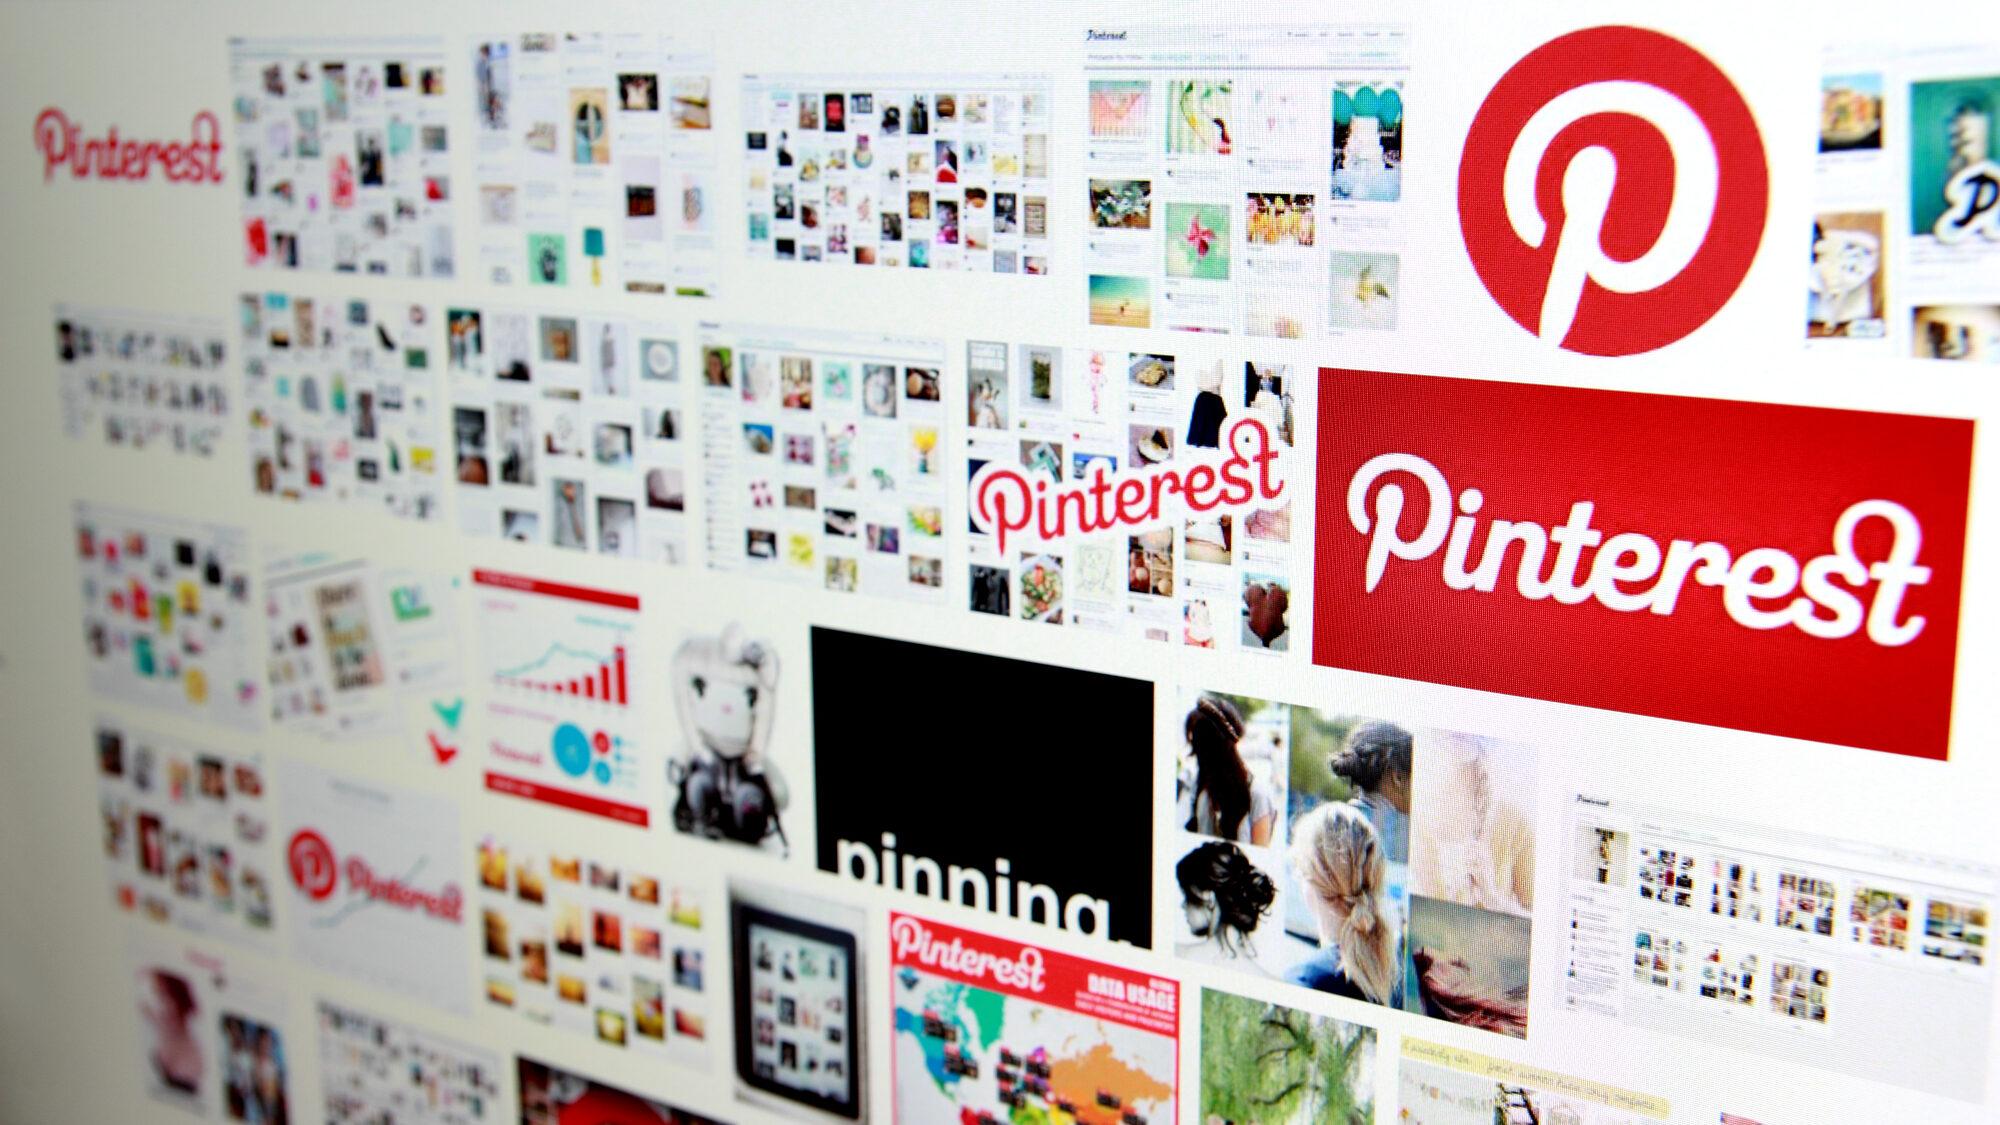 Pinterest in serach engine on a computer screen.